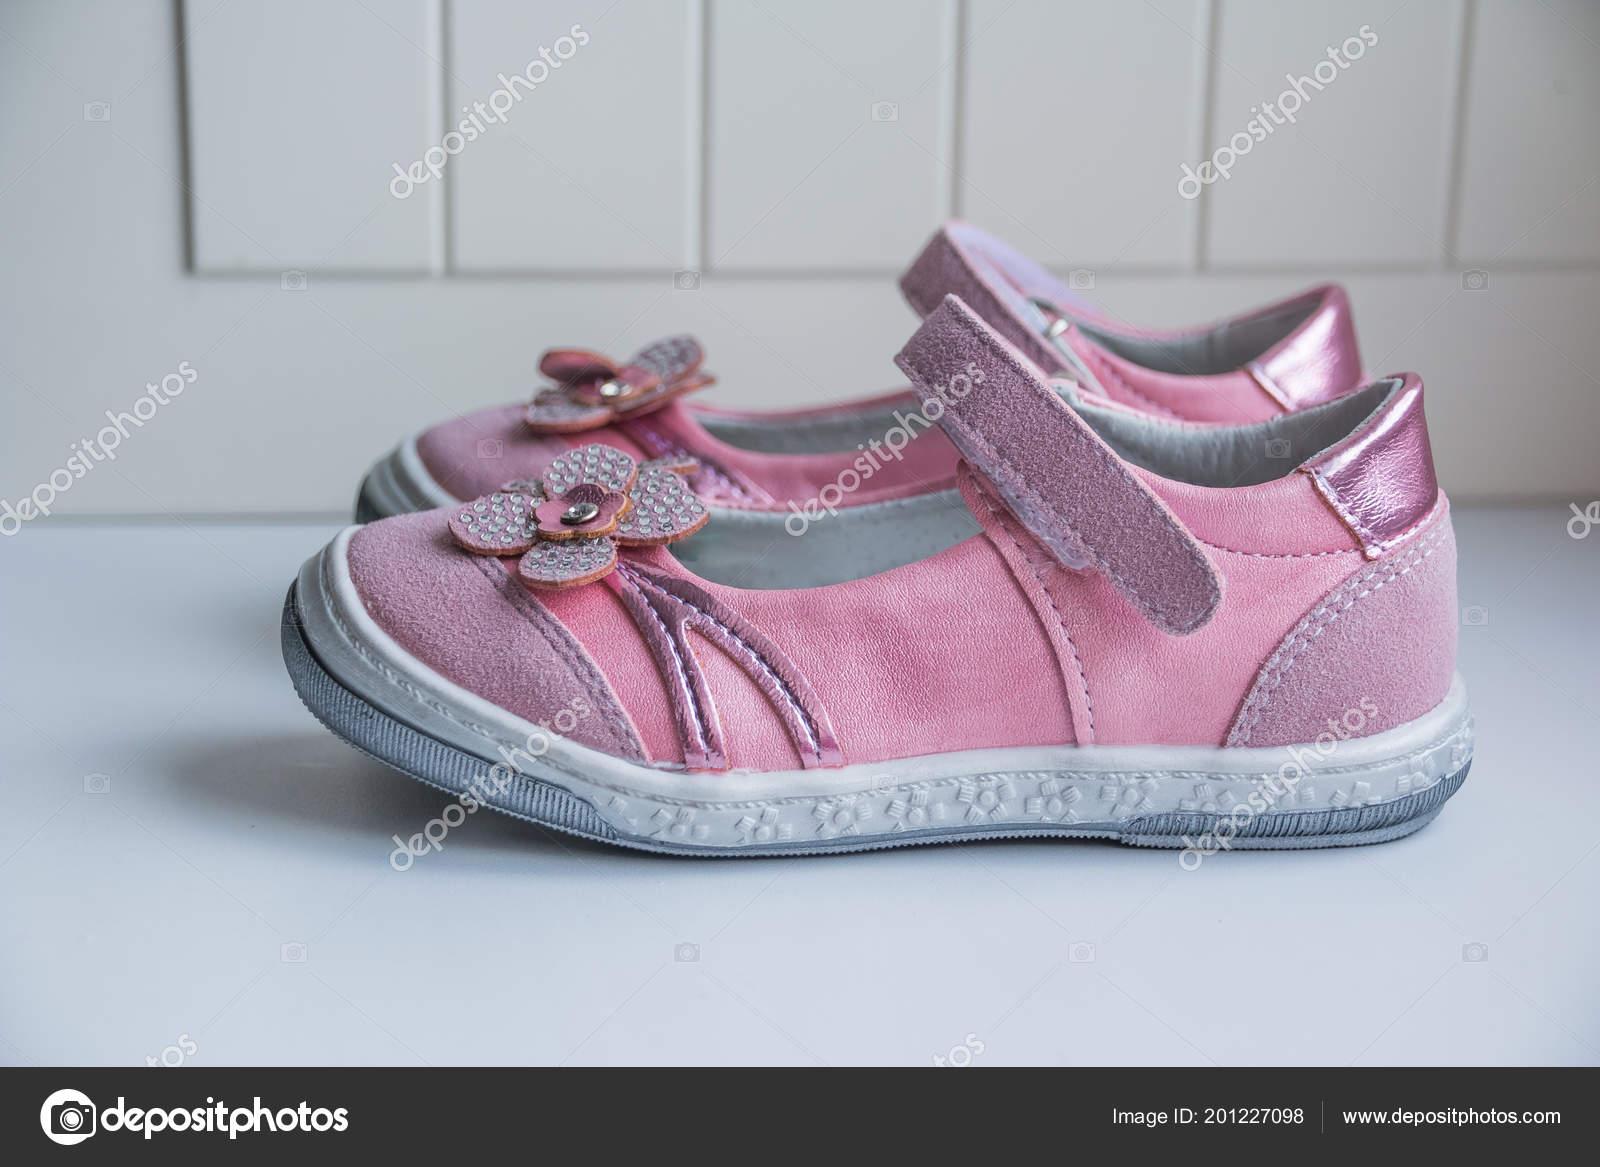 eaa34d32774 Πέδιλα Ροζ childs απομονωμένα σε λευκό. Ένα ζευγάρι των ροζ μικρό κορίτσι  σανδάλια. Χώρο αντίγραφο — Εικόνα από ...